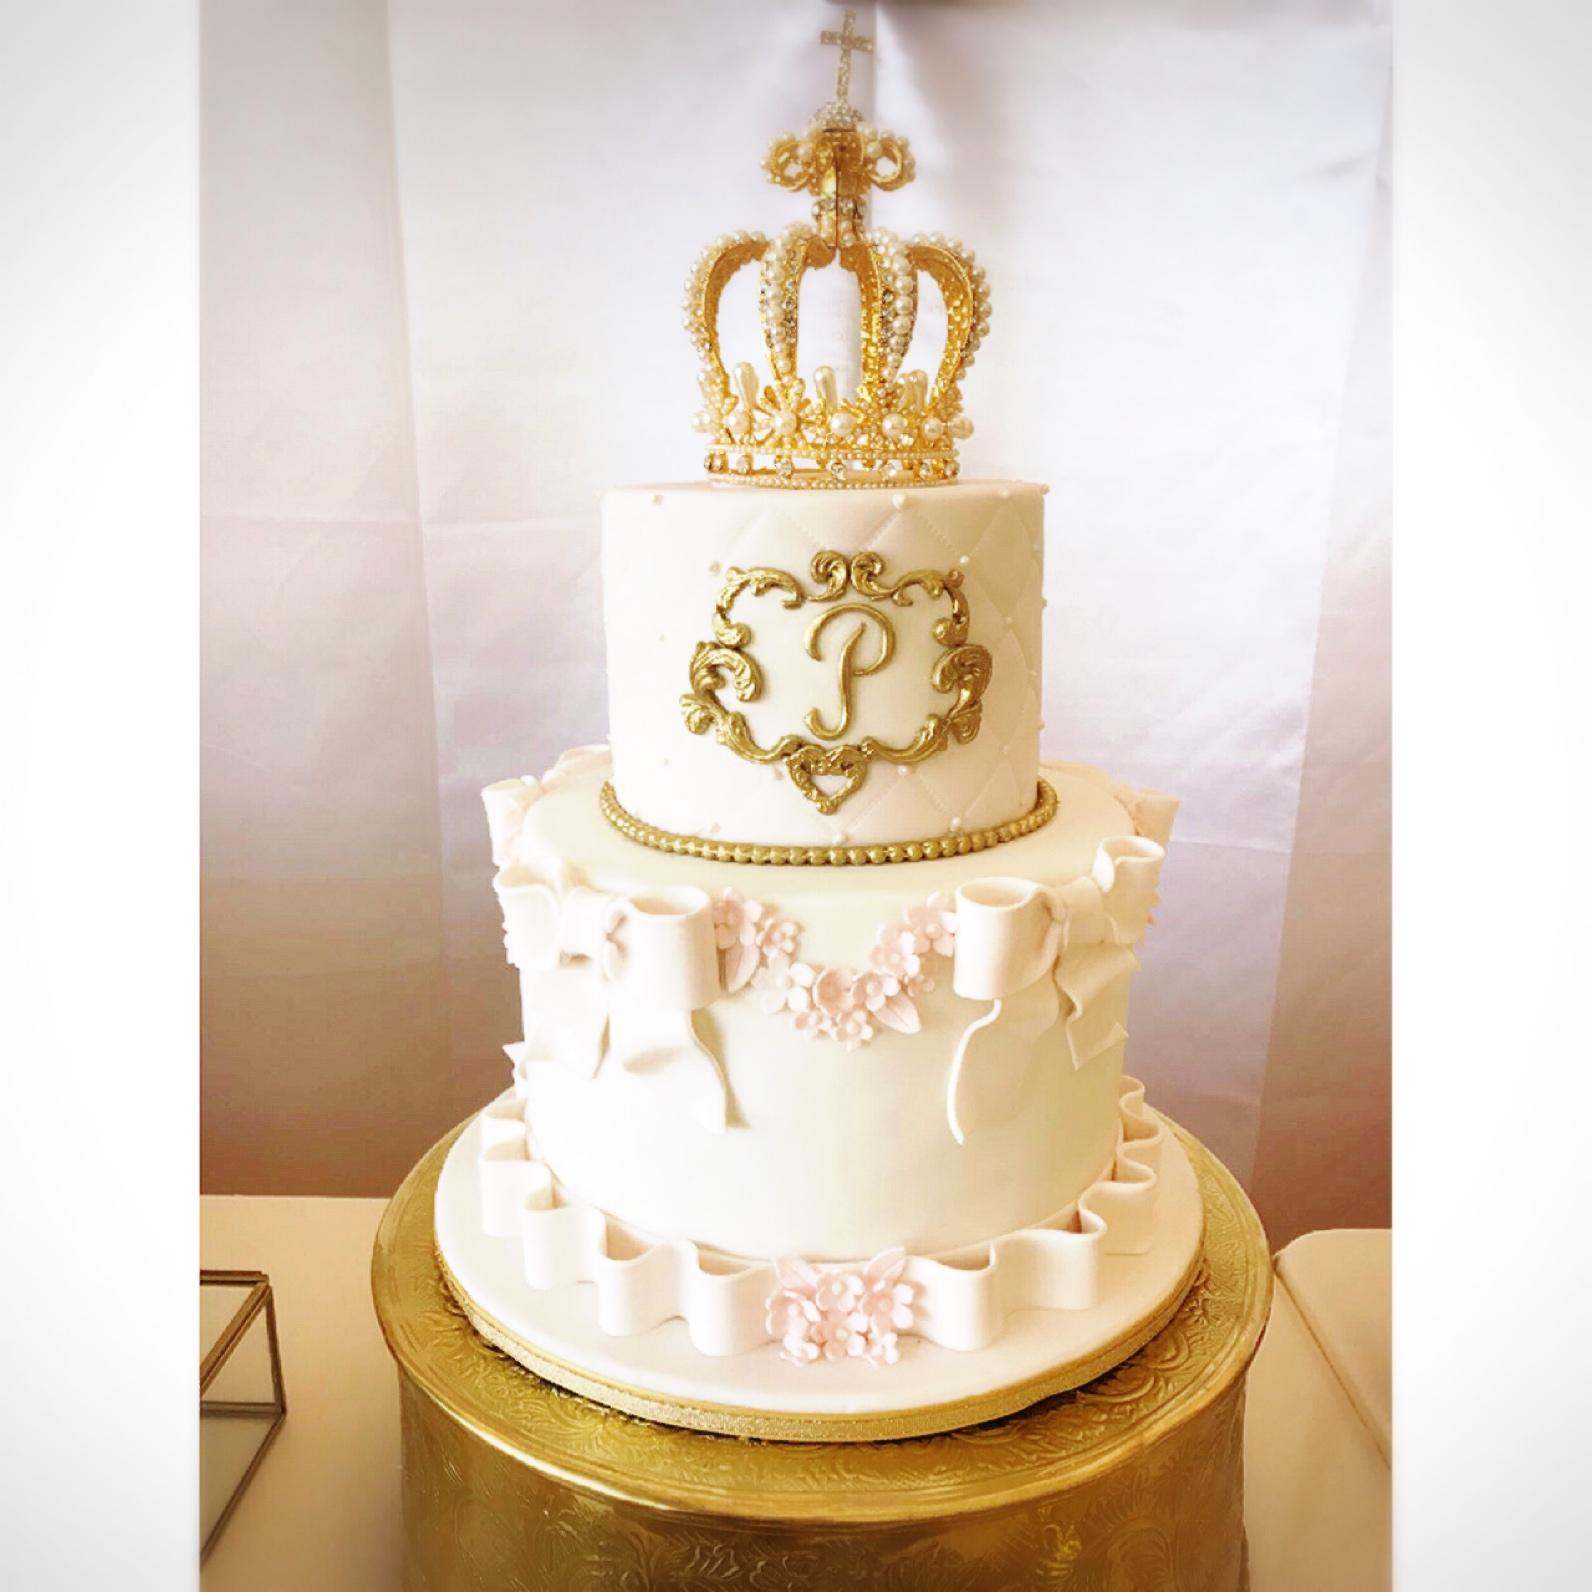 Pink and white princess crown birthday cake